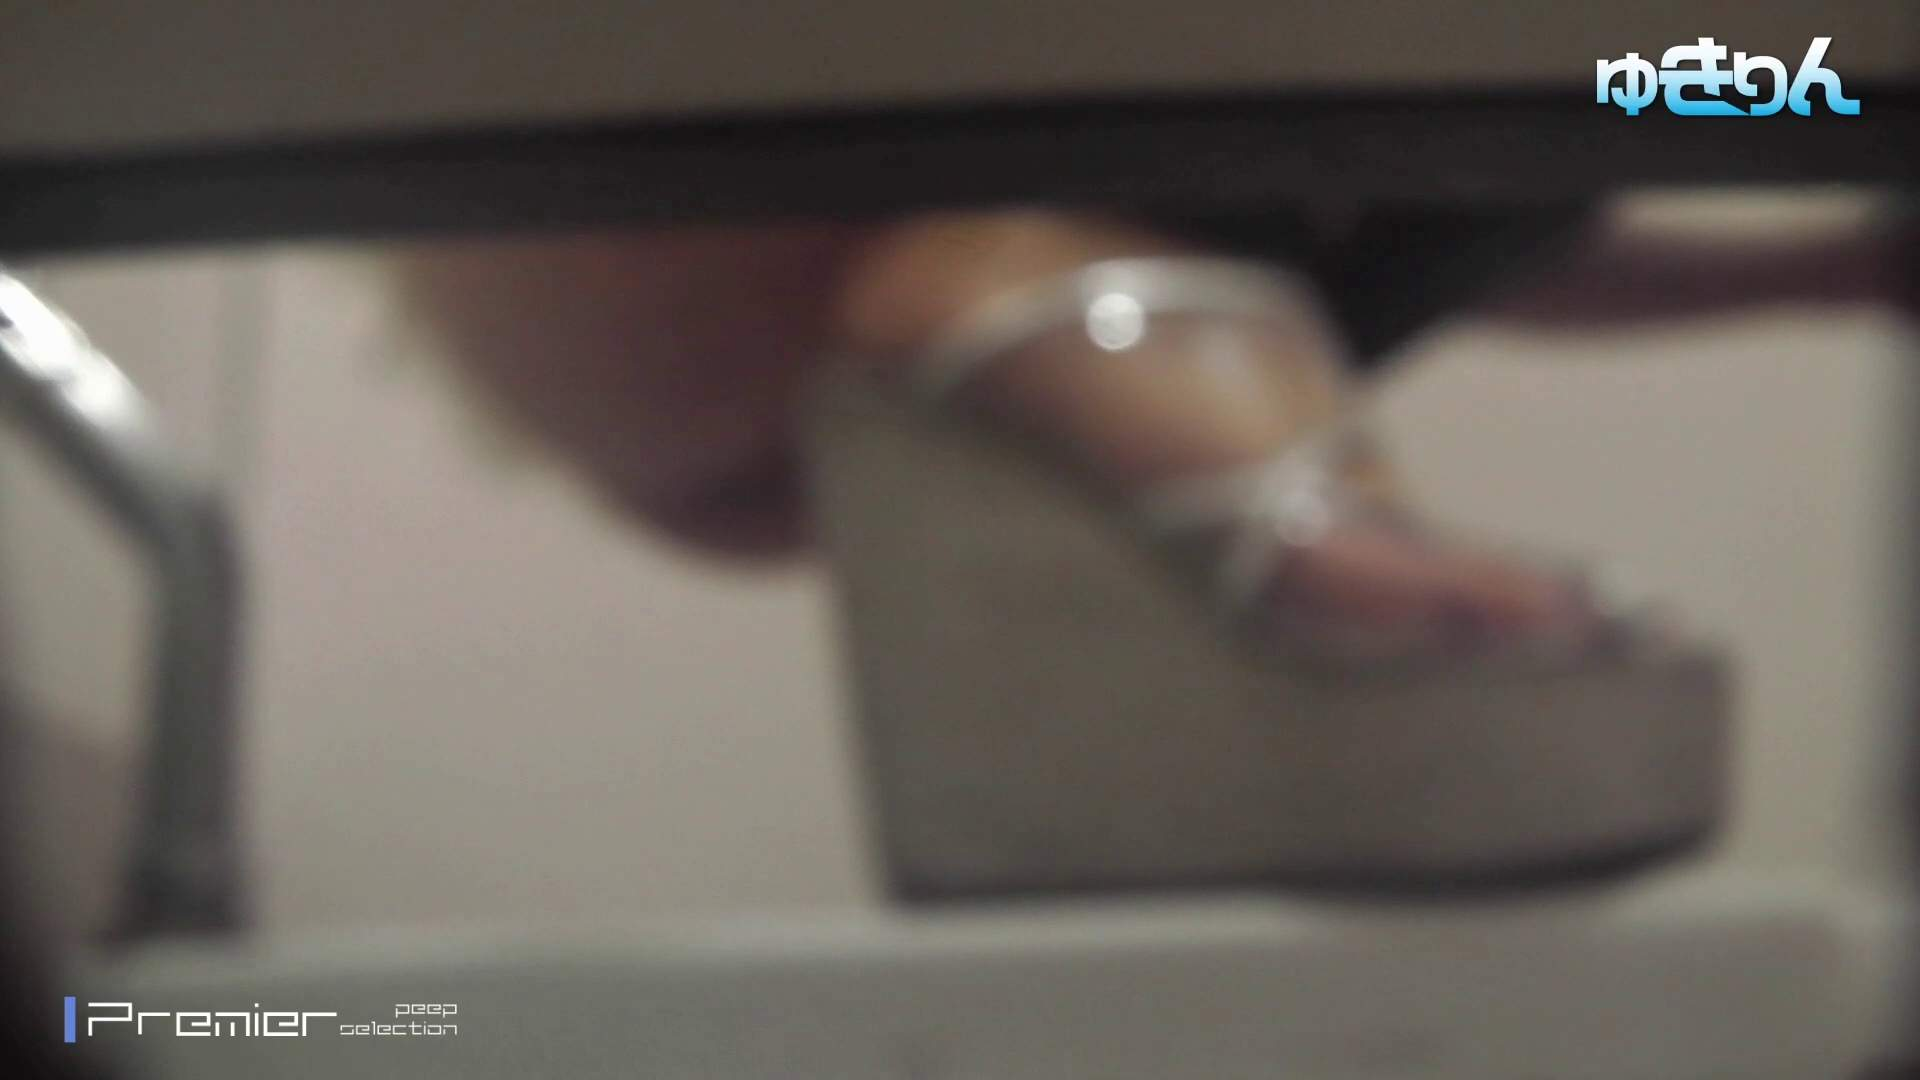 cm友達同士三人グループの二人を同時に捕獲【新世界の射窓からNo120】 むっちり セックス無修正動画無料 92画像 43